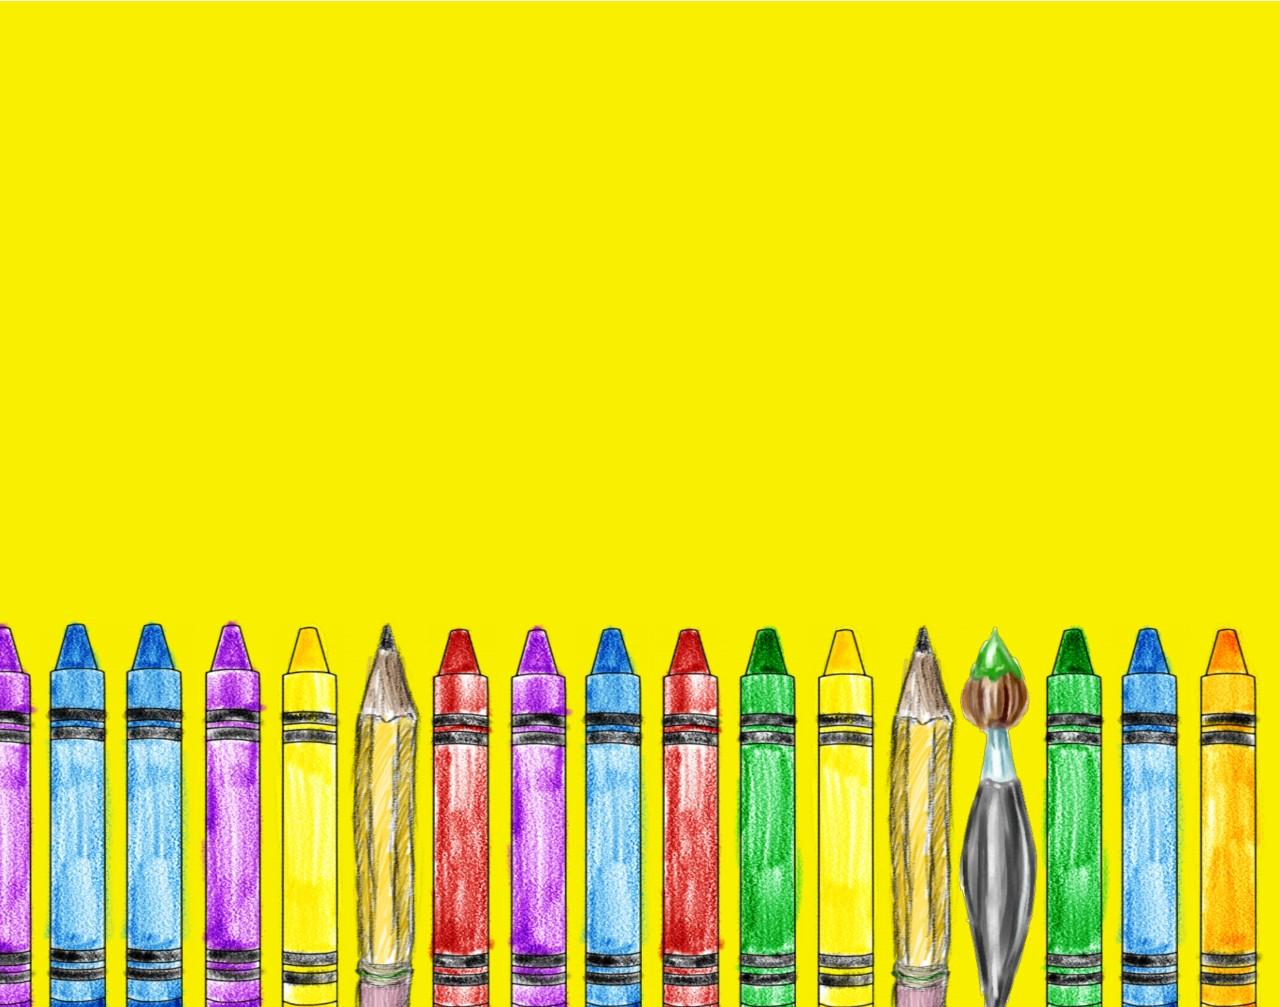 Best 40 First Day of School Desktop Background on HipWallpaper 1280x1007